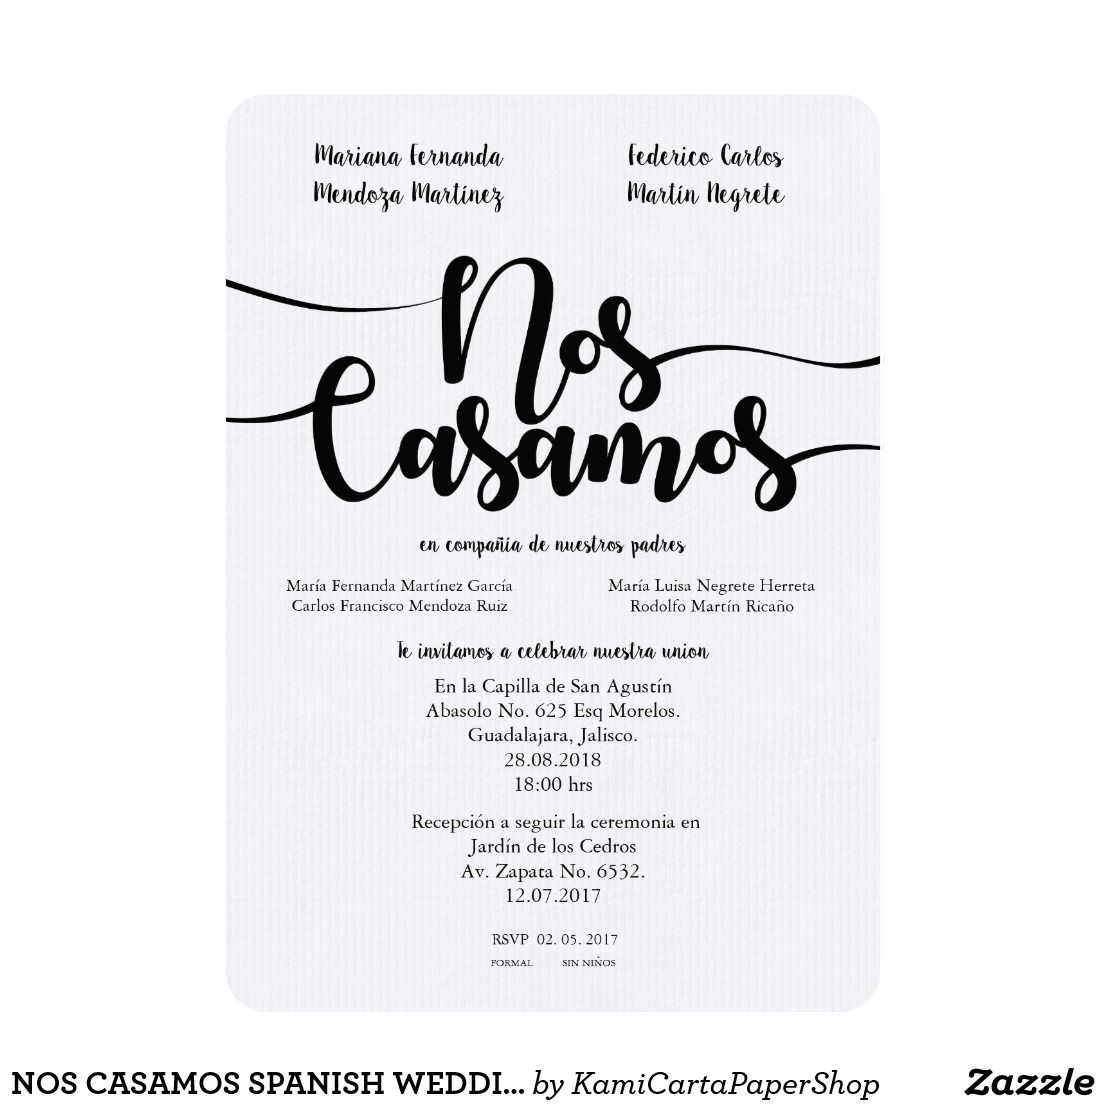 Nos Casamos Spanish Weddin Invitation Zazzle Com Spanish Wedding Invitations Fun Wedding Invitations Weddin Invitations